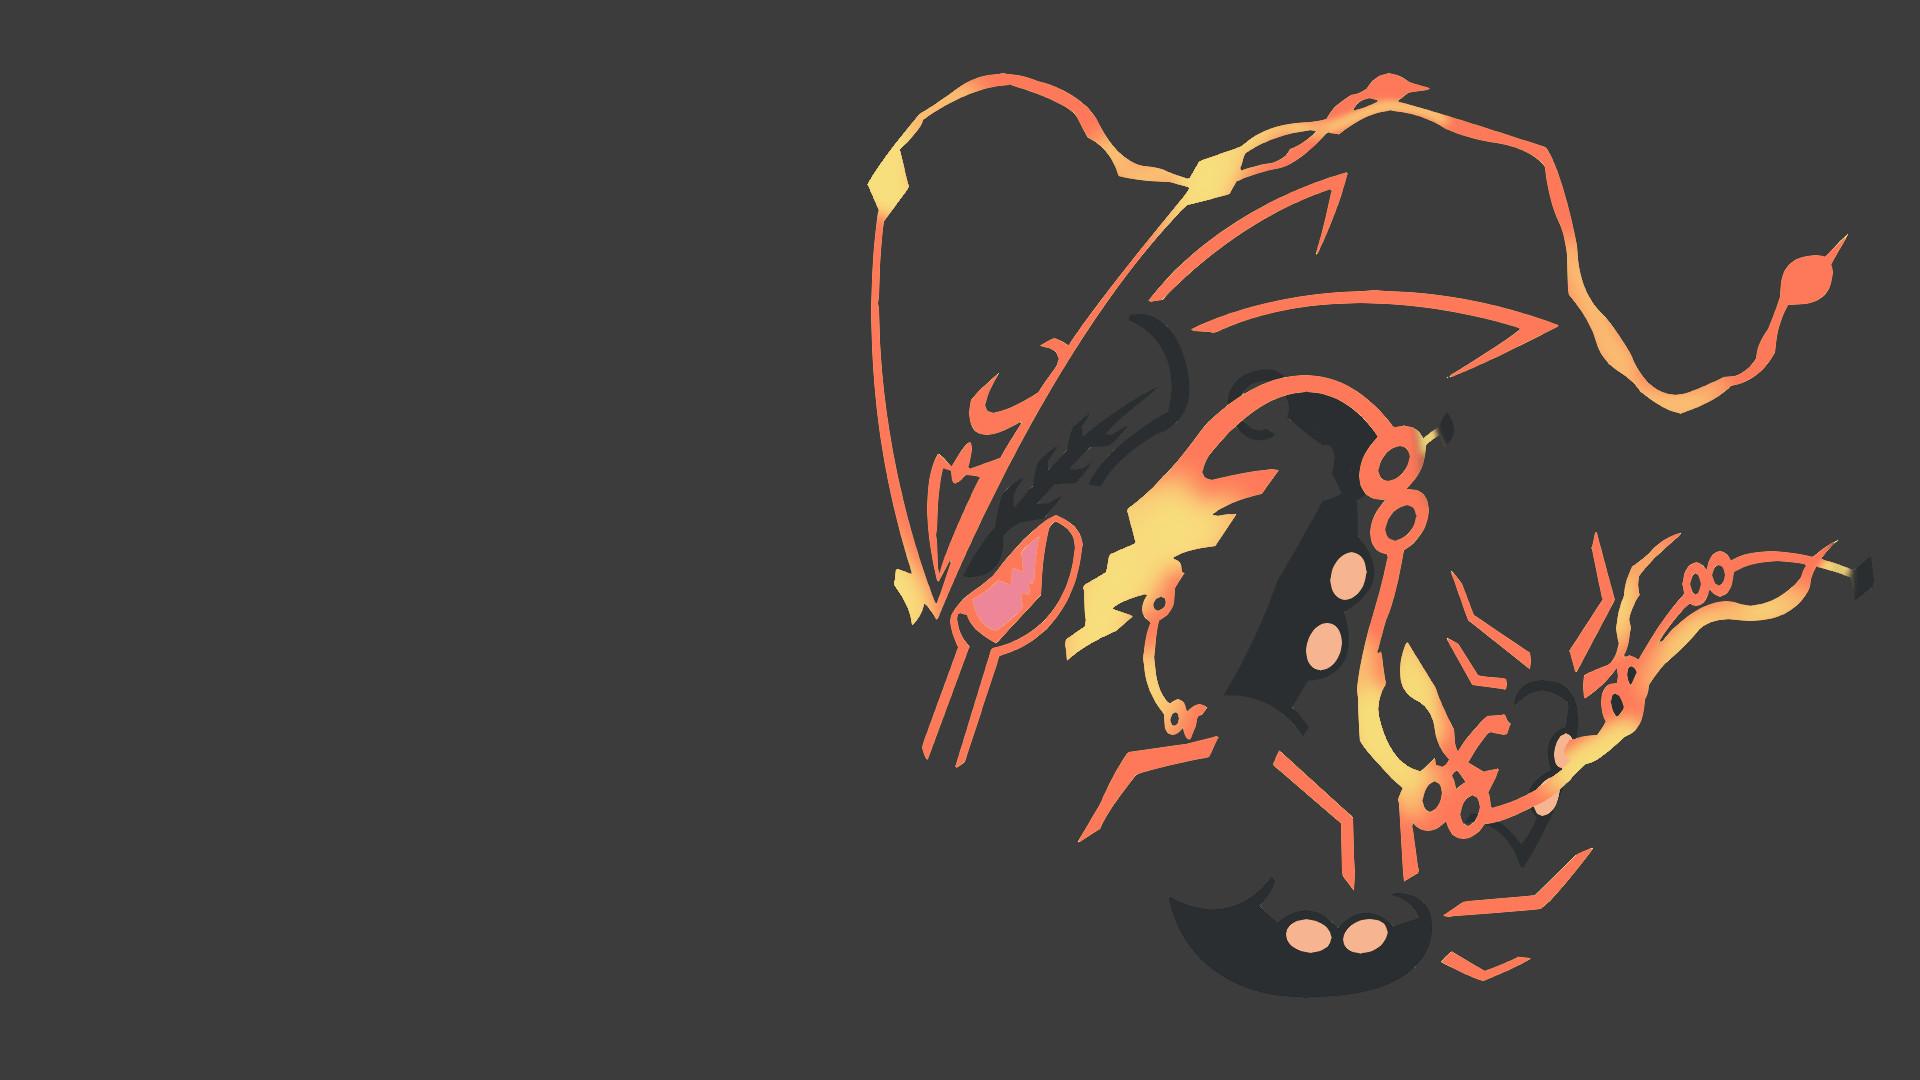 Mega Shiny Rayquaza Wallpaper by dracodragonblast on DeviantArt